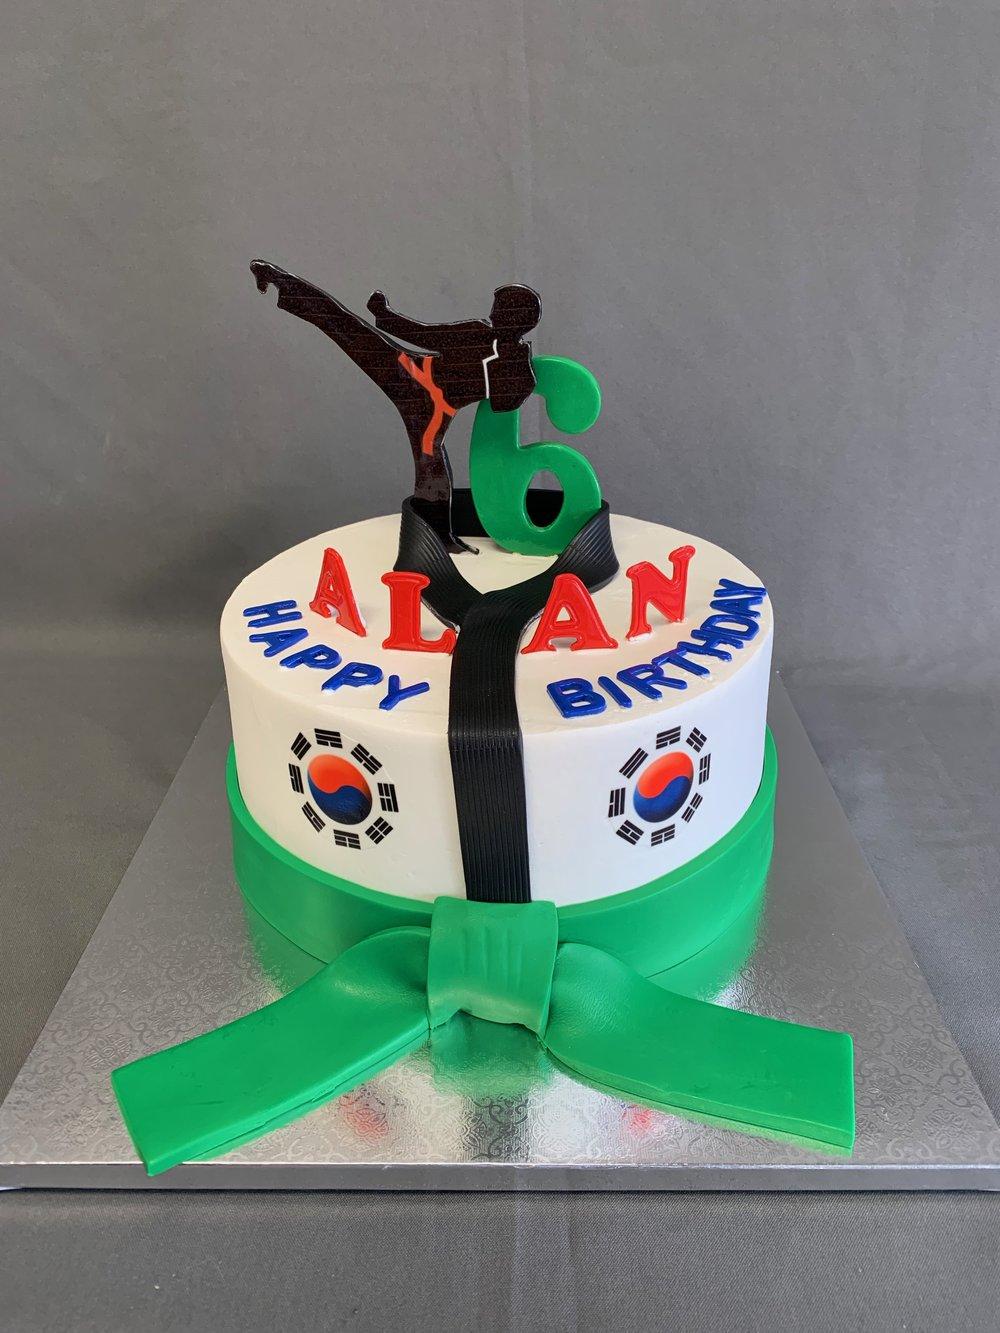 New Jersey Taekwondo Cake